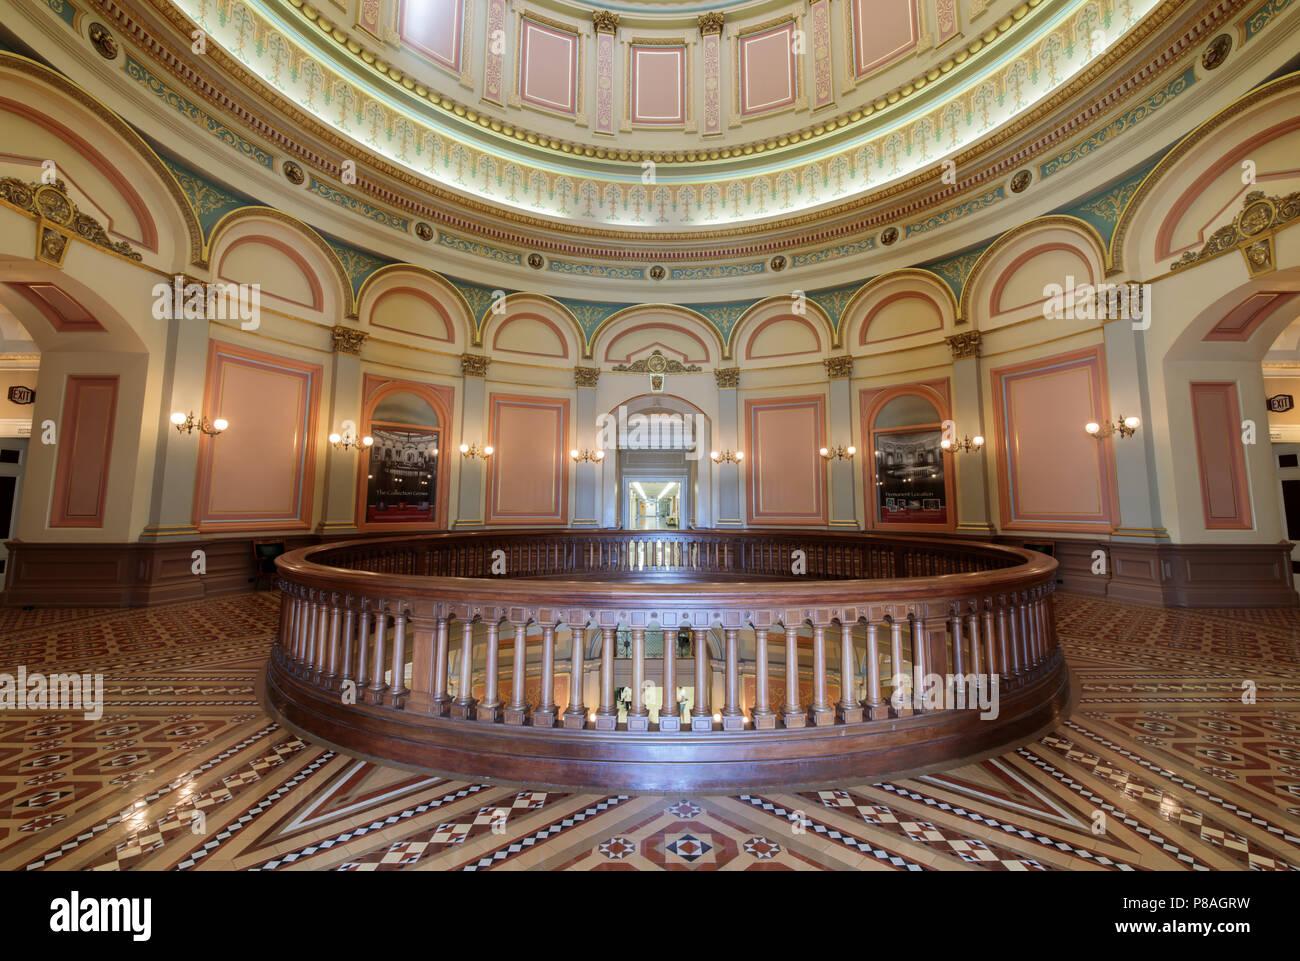 Sacramento, California - July 6, 2018: California State Capitol's 2nd floor rotunda. - Stock Image